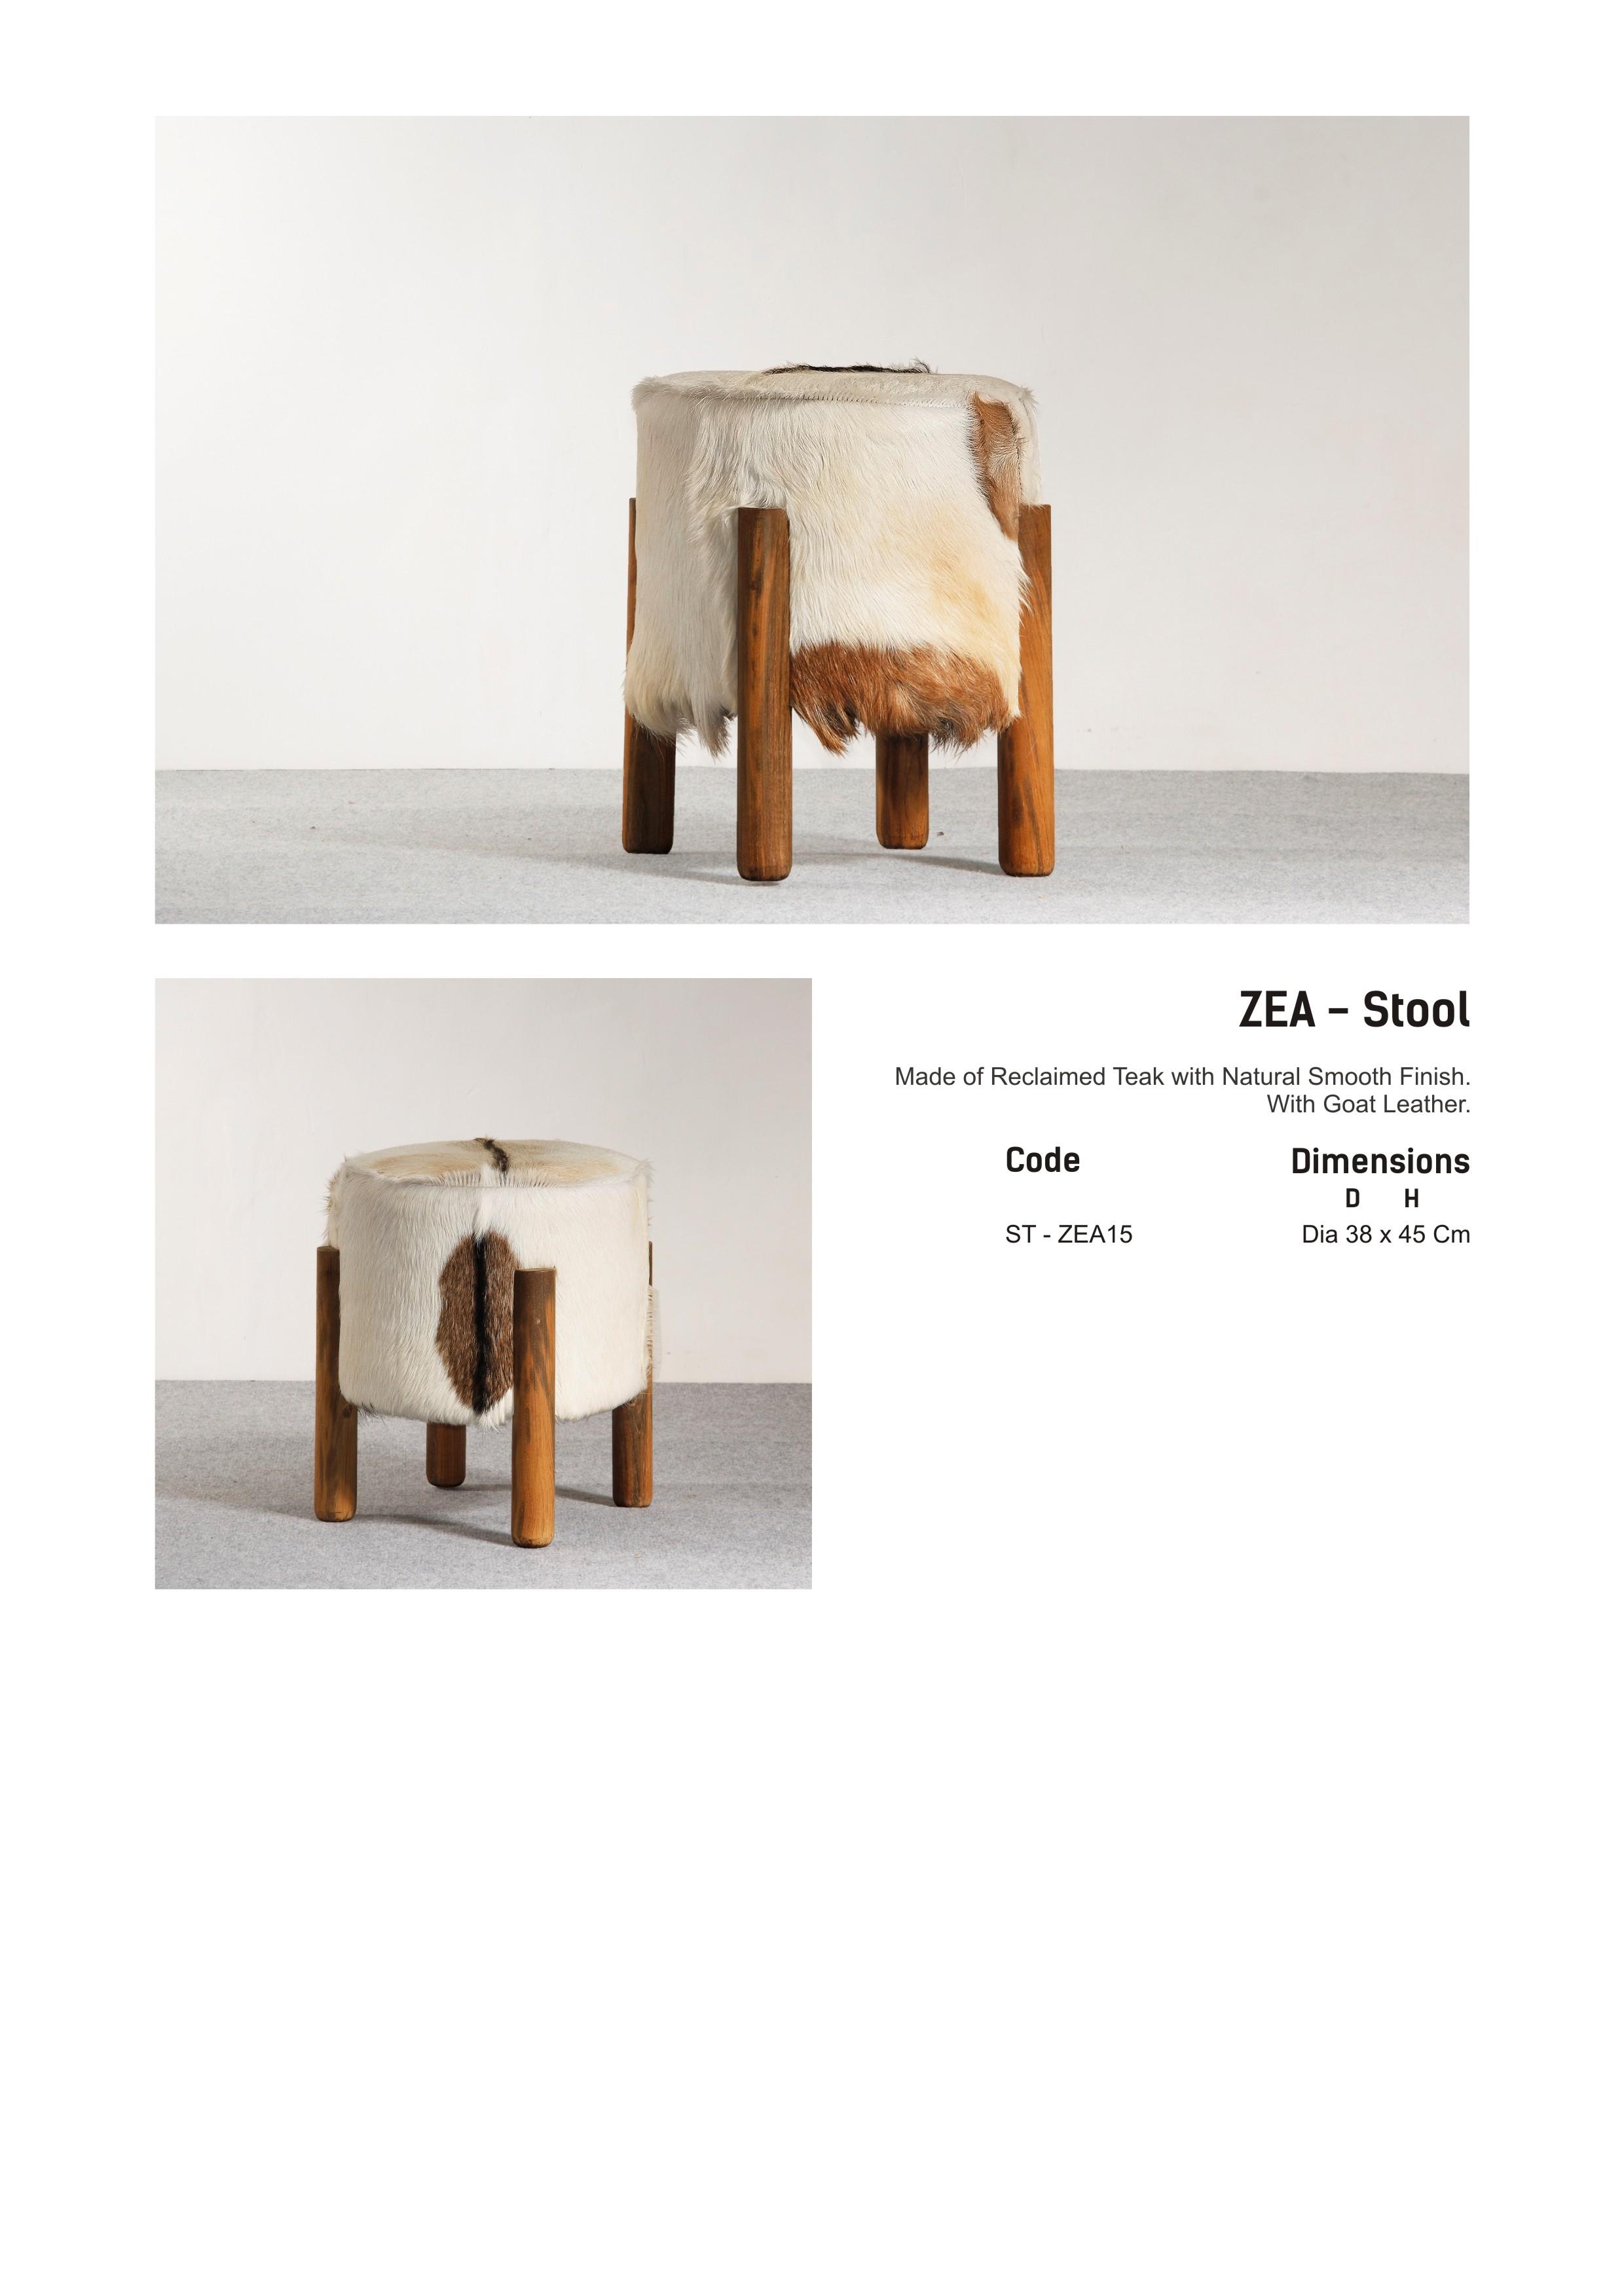 15. ZEA - Stool